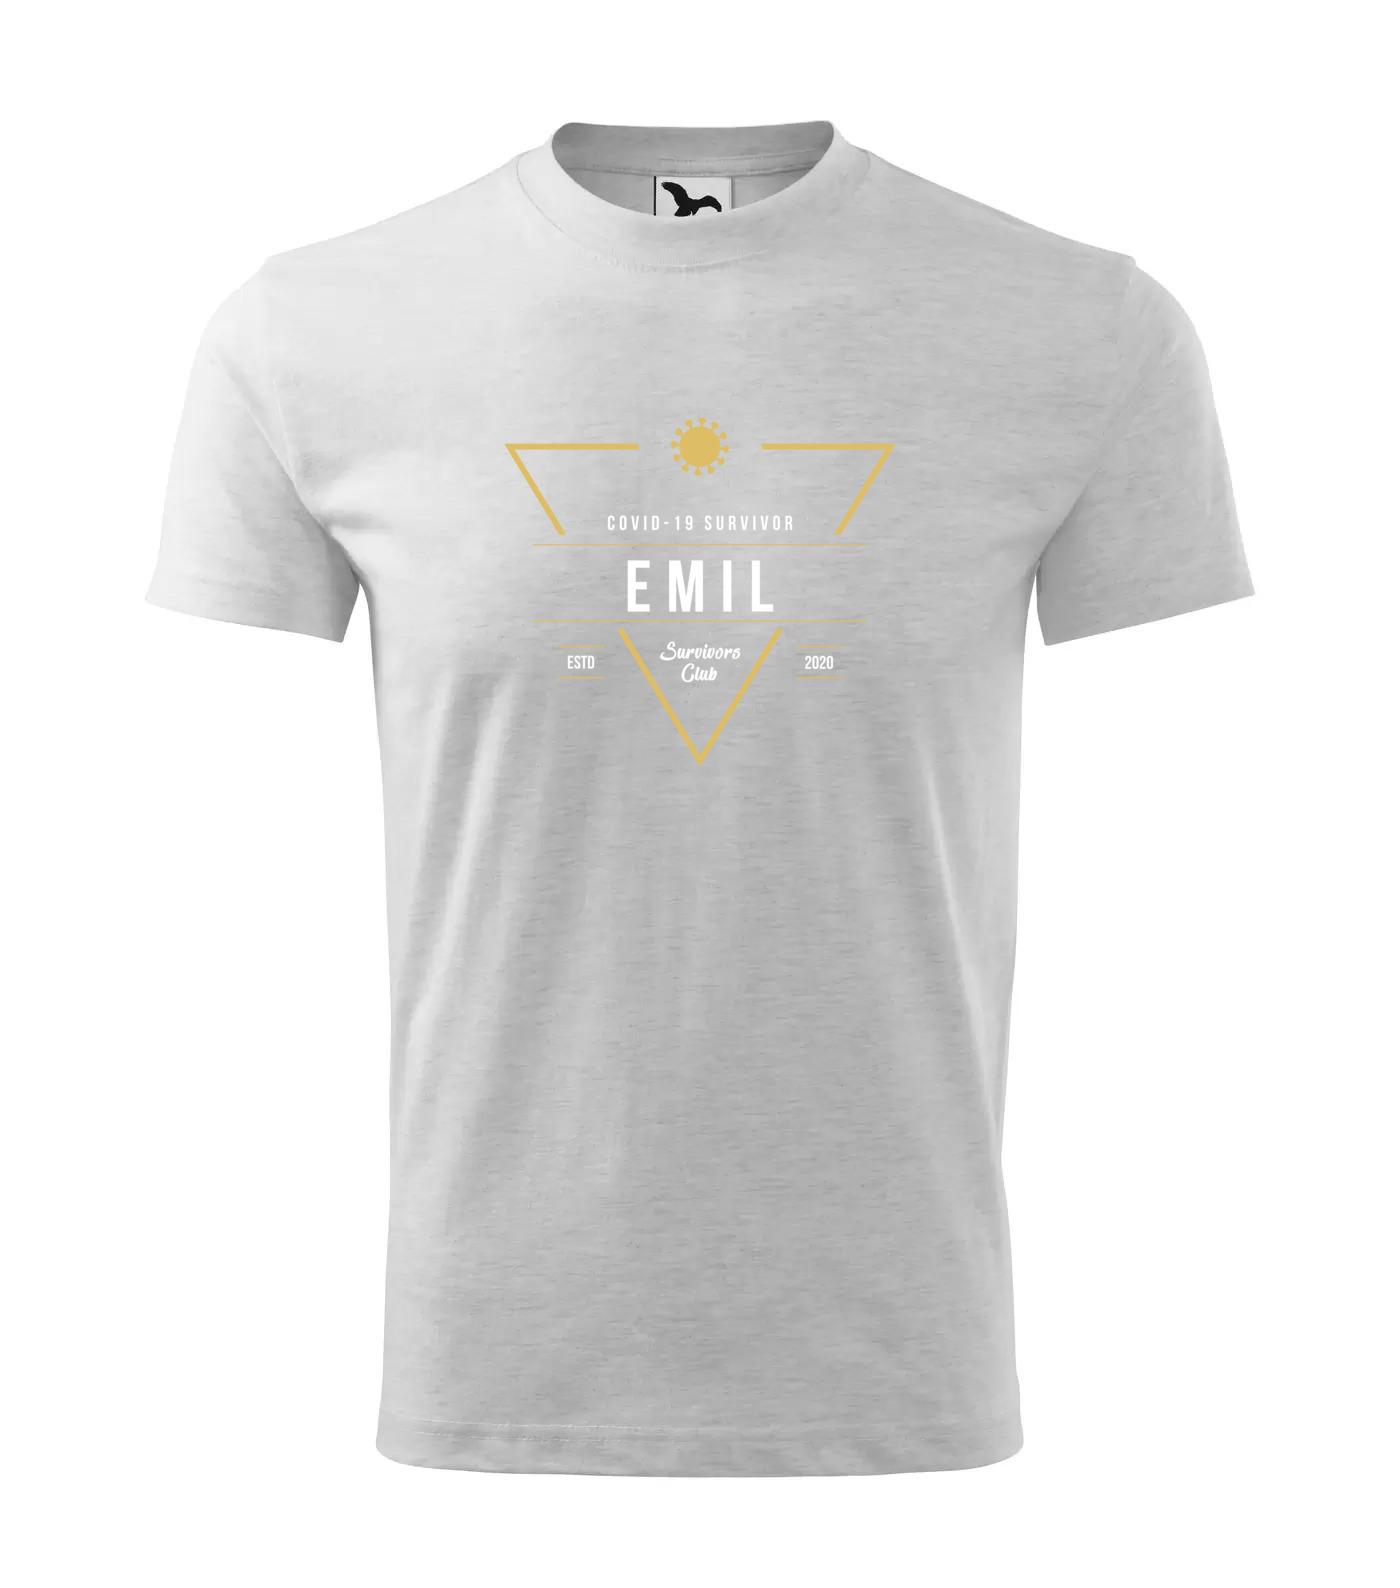 Tričko Survivor Club Emil